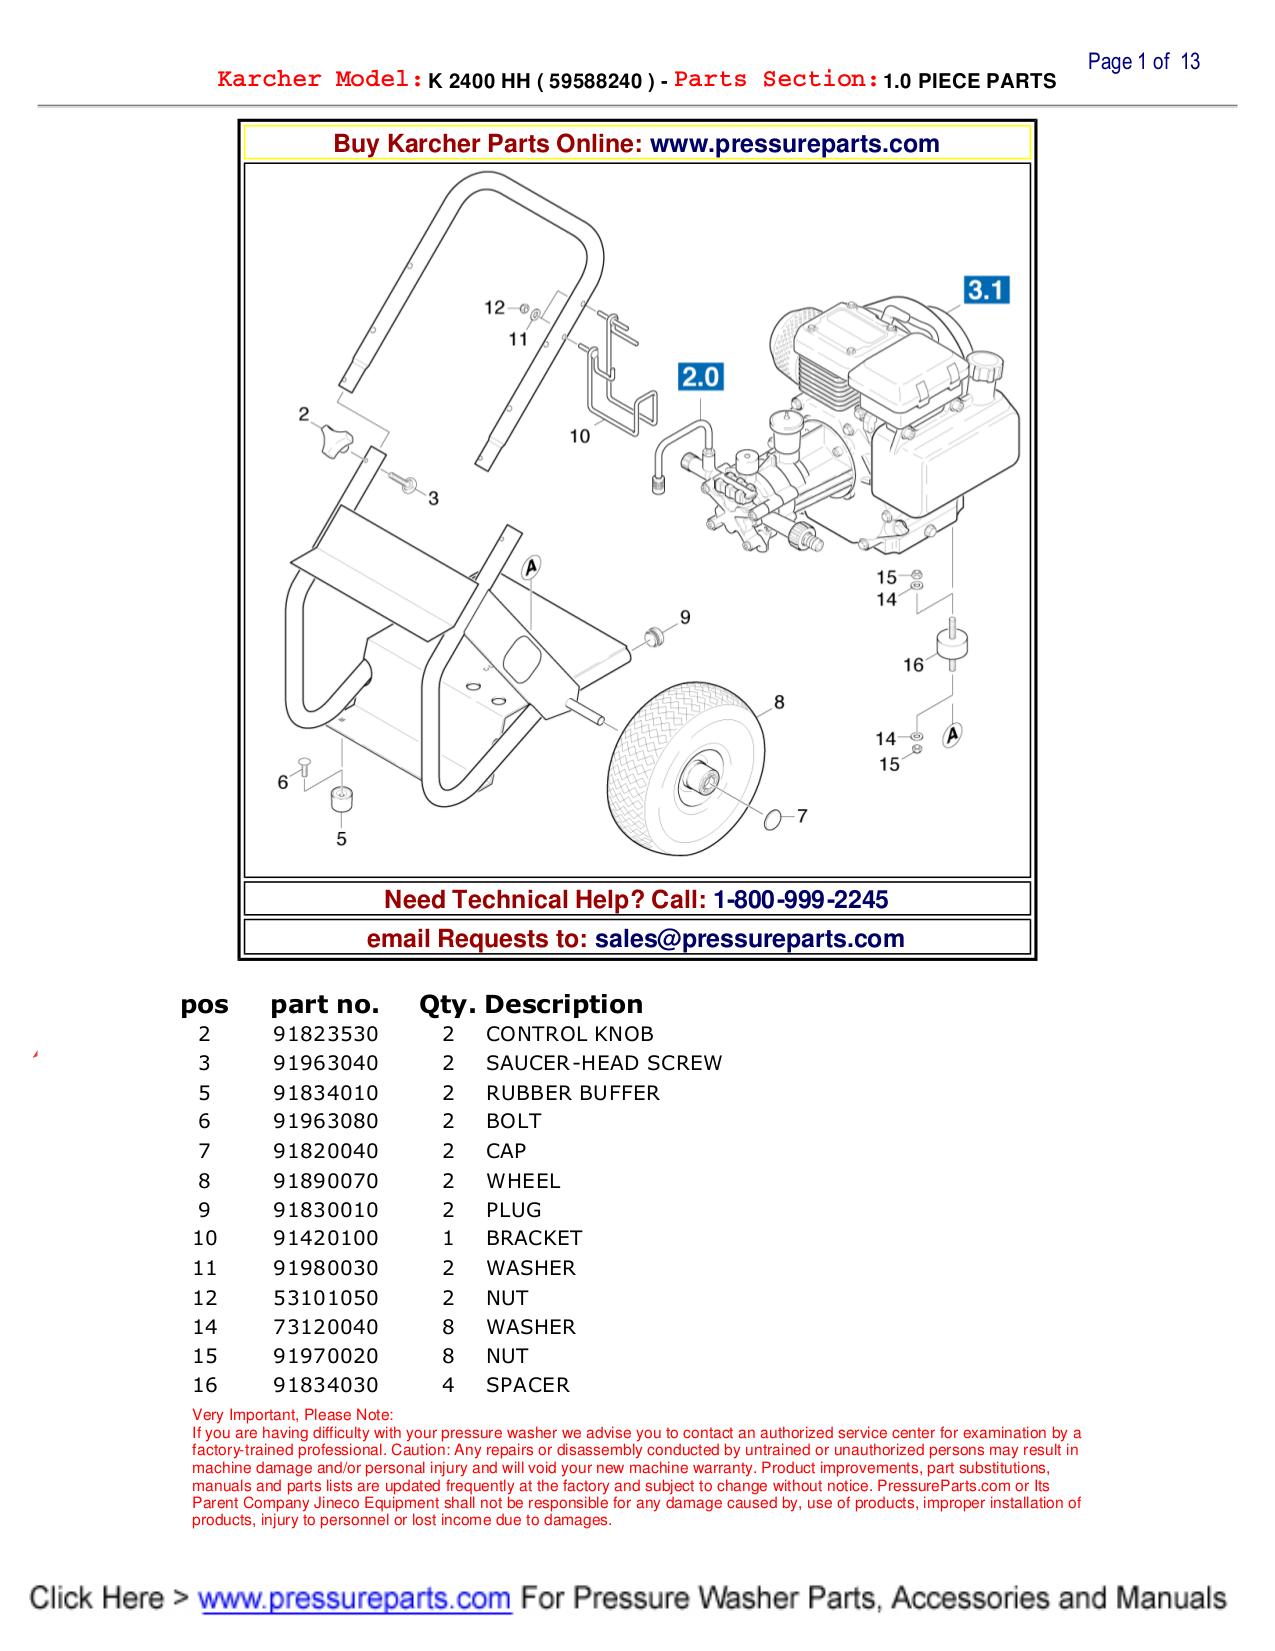 karcher g 2650 hh manual